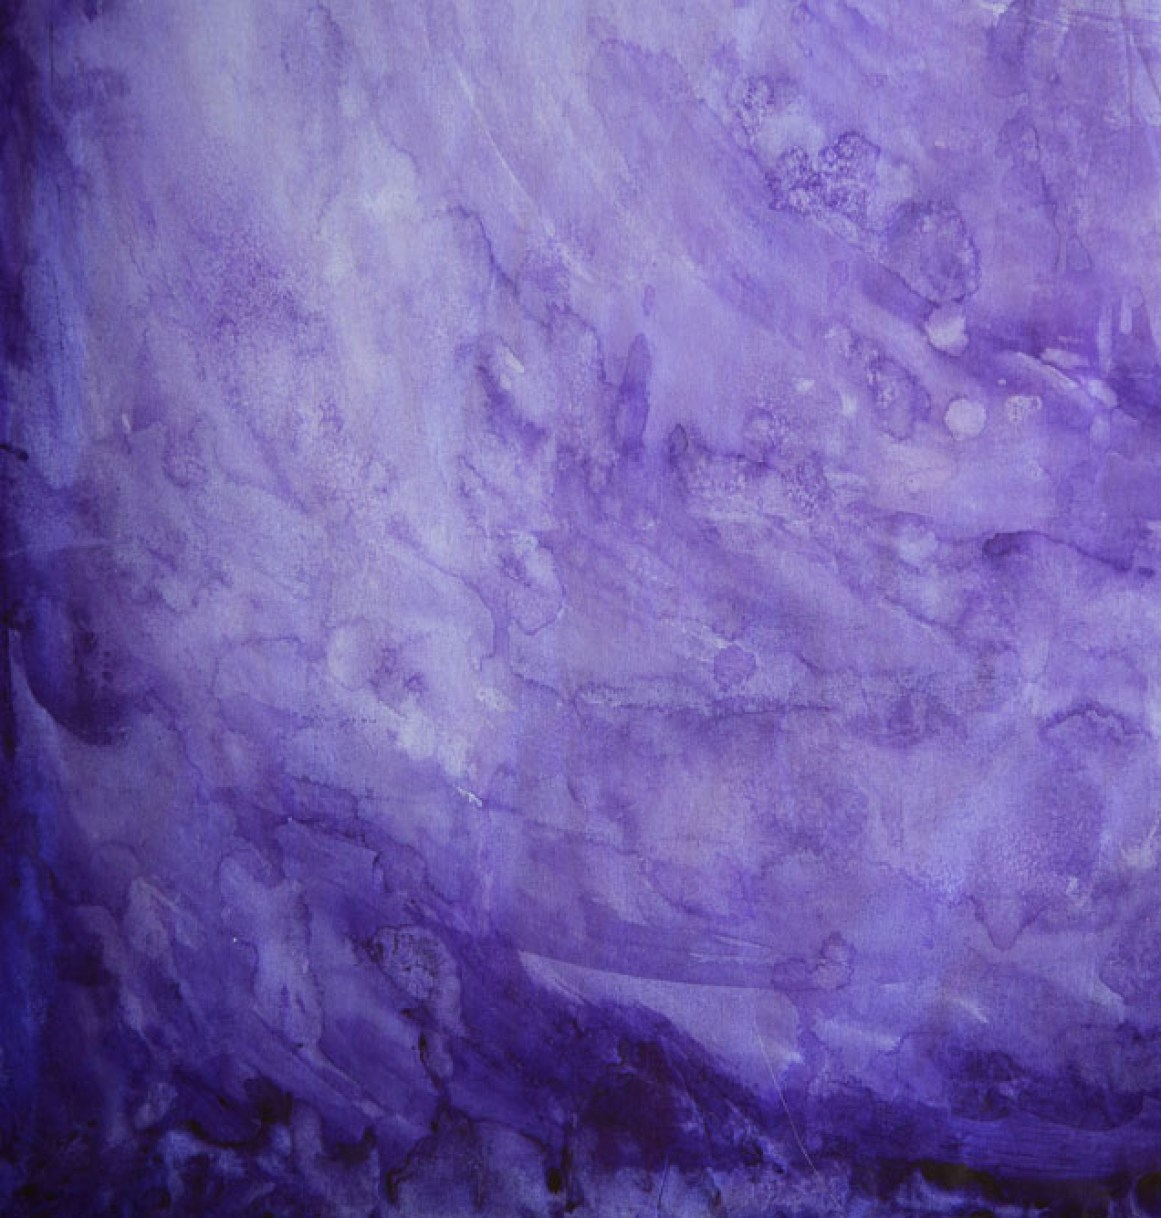 Purple Orchid Petal #2